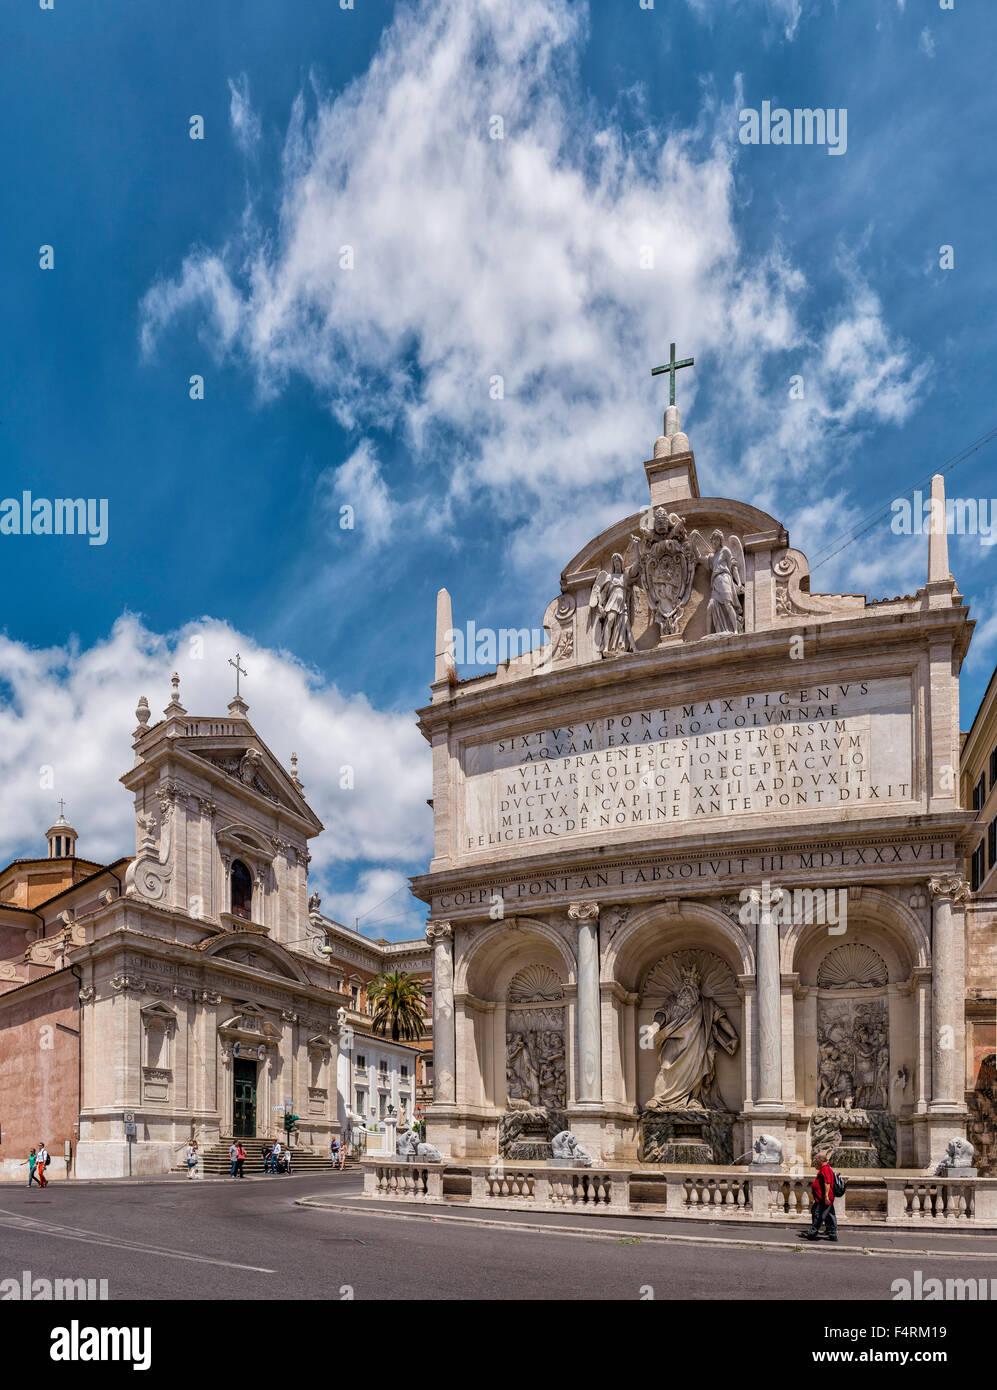 Italy, Europe, Lazio, Rome, Roma, city, village, spring, people, church, Largo di Santa Susanna, Piazzo di San Bernardo - Stock Image